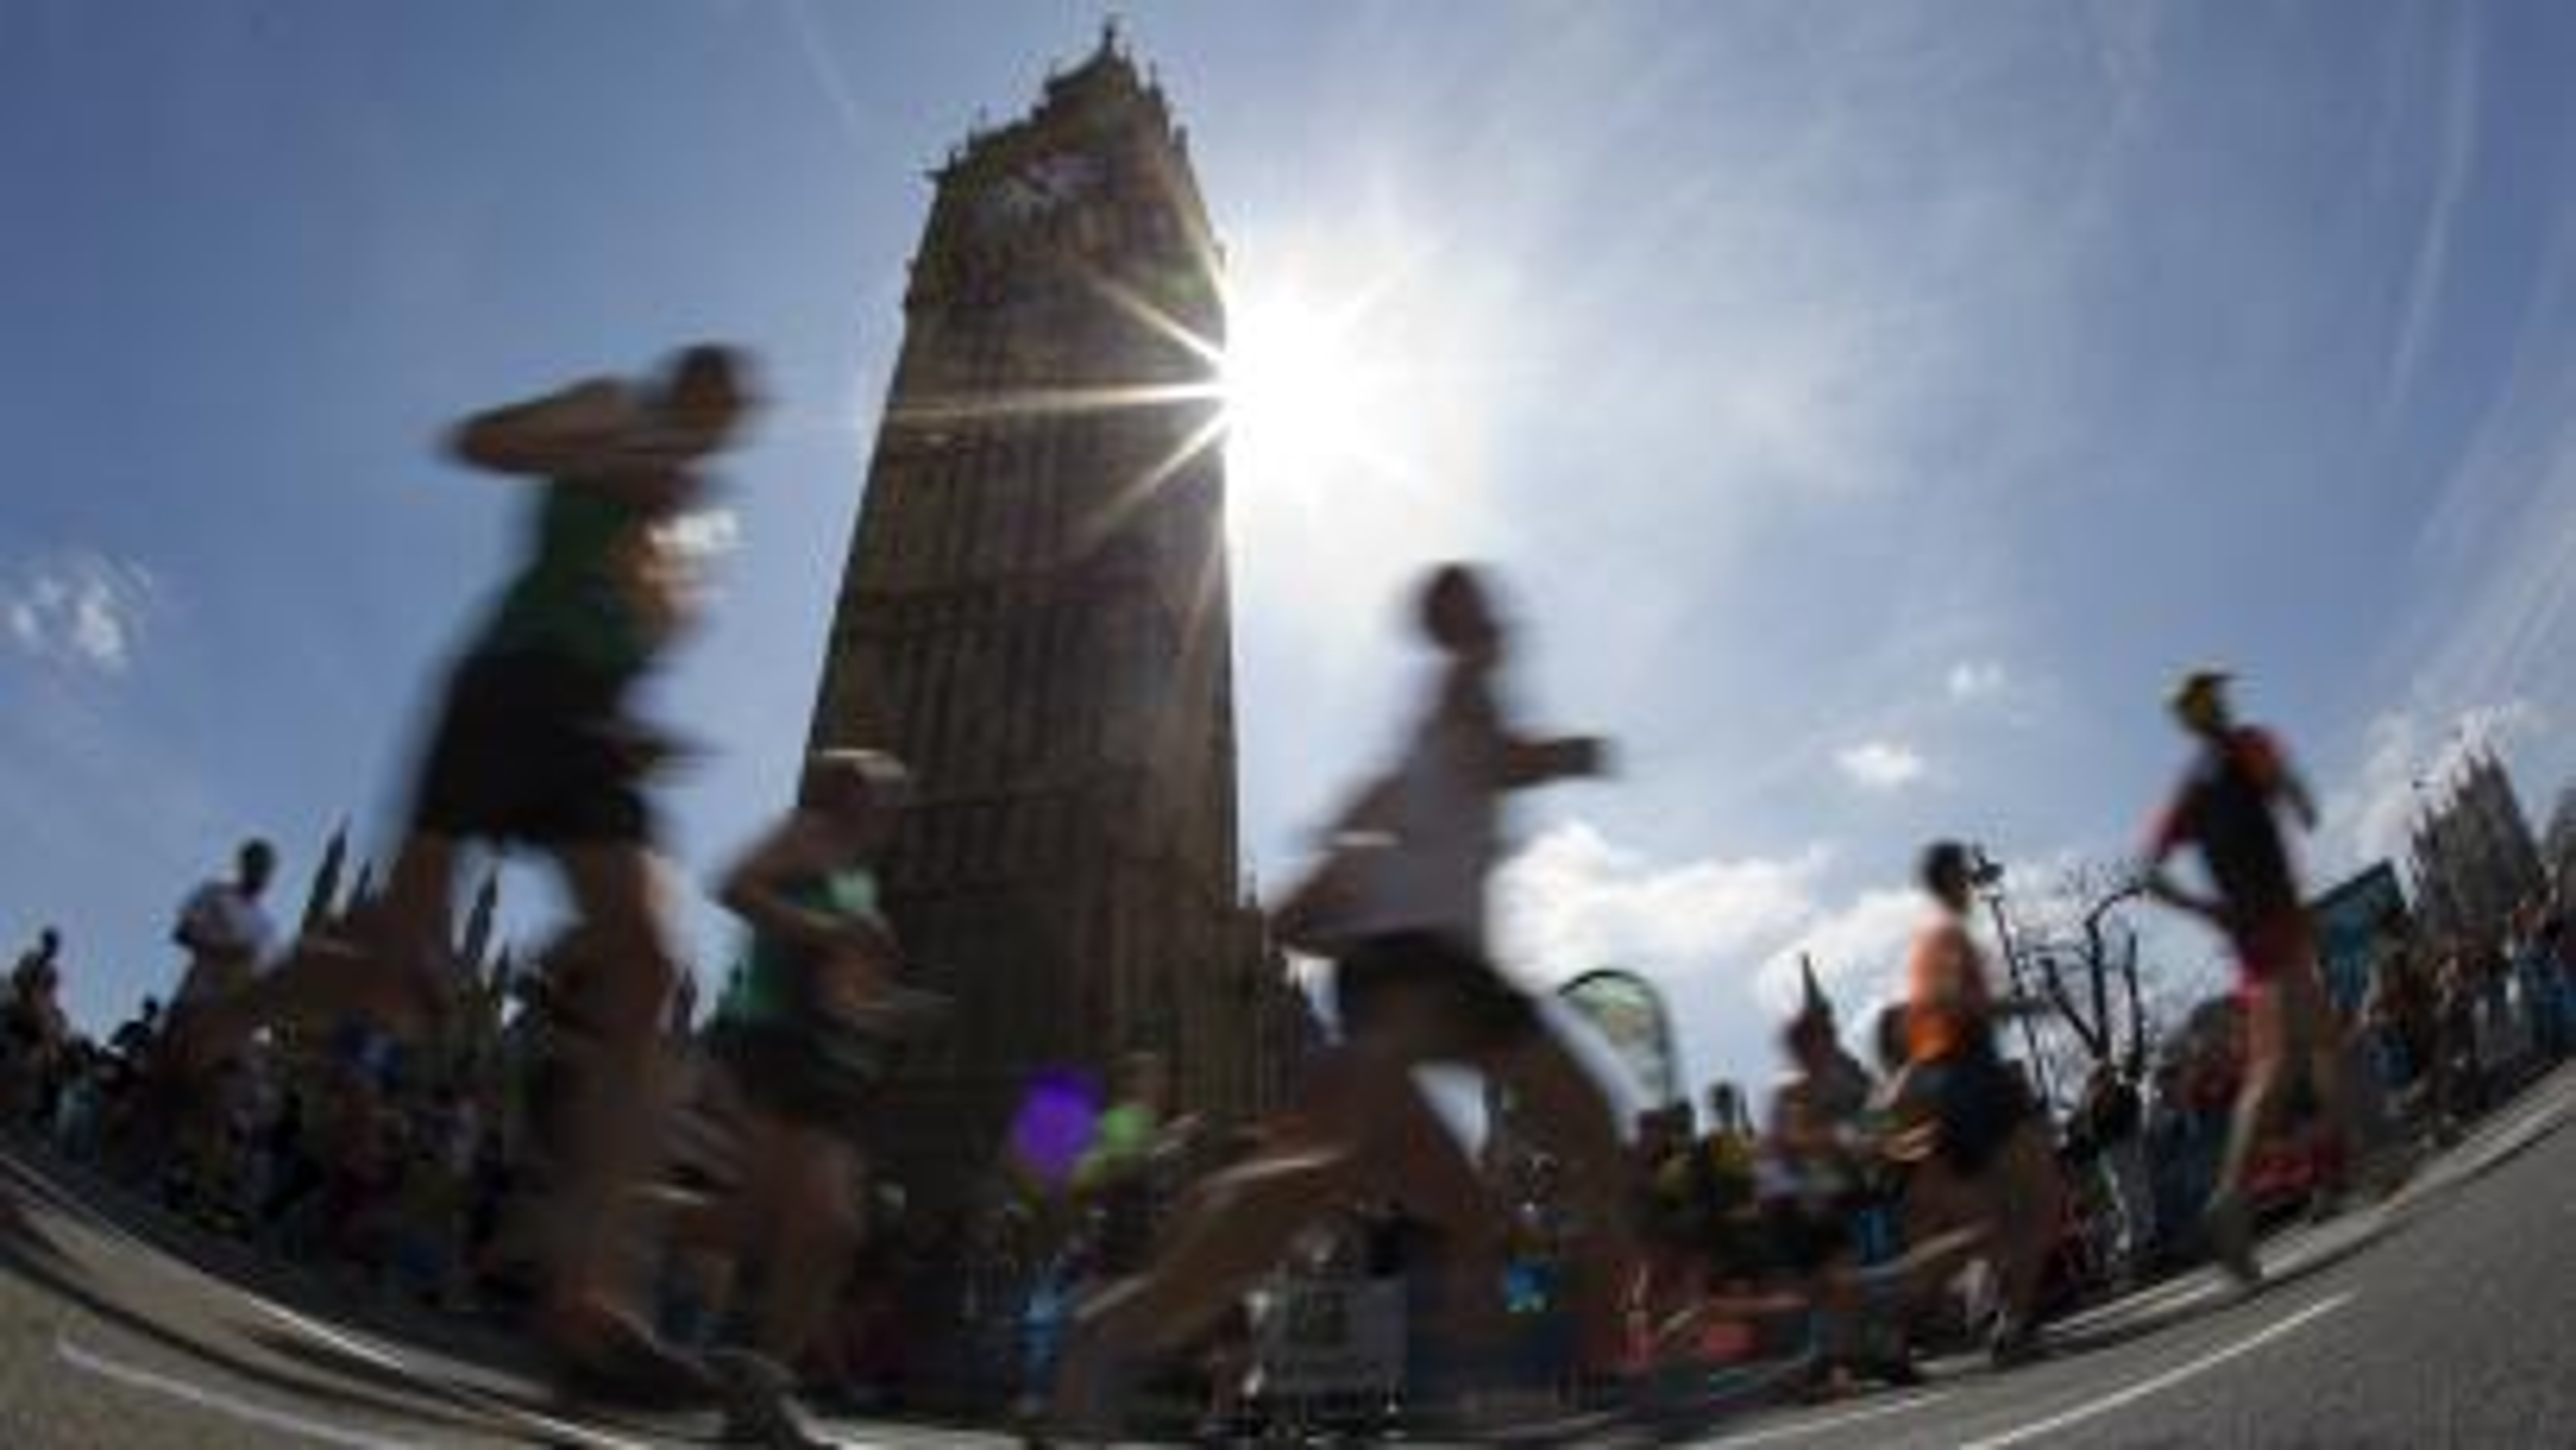 London Marathon runners going by Big Ben.